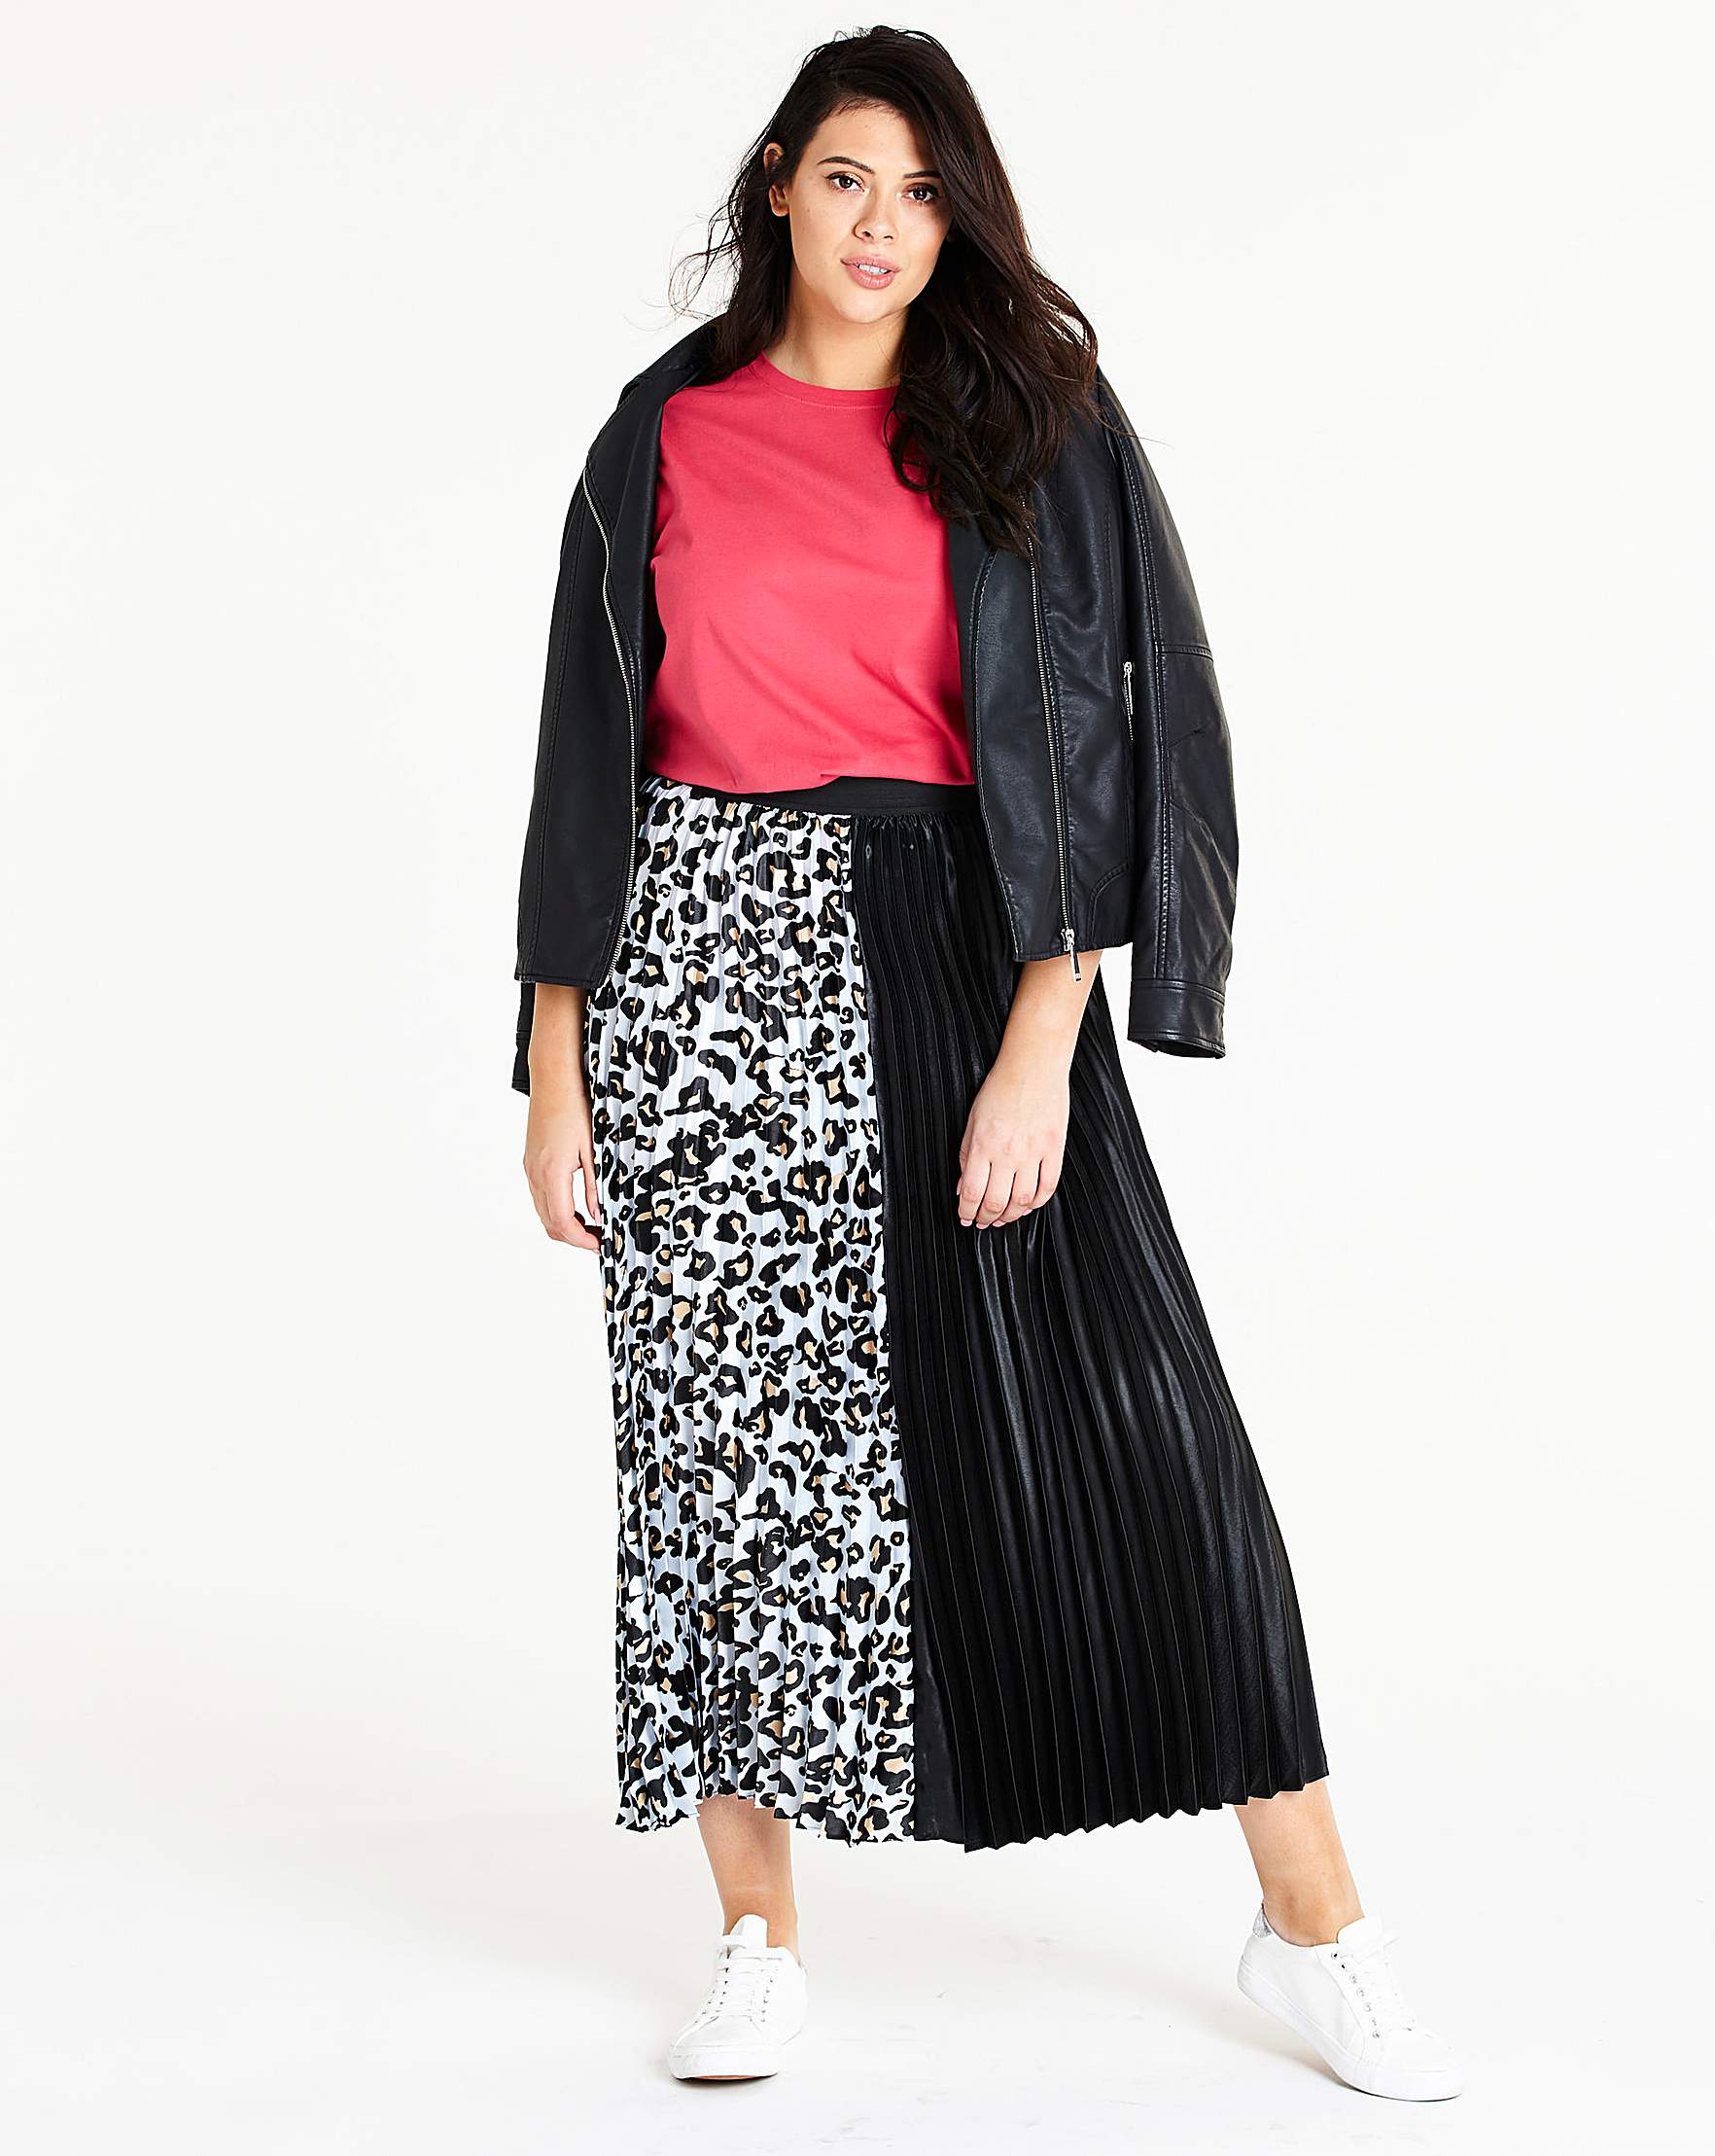 23420f1532 Black & White Sunray Pleat Maxi Skirt   Simply Be